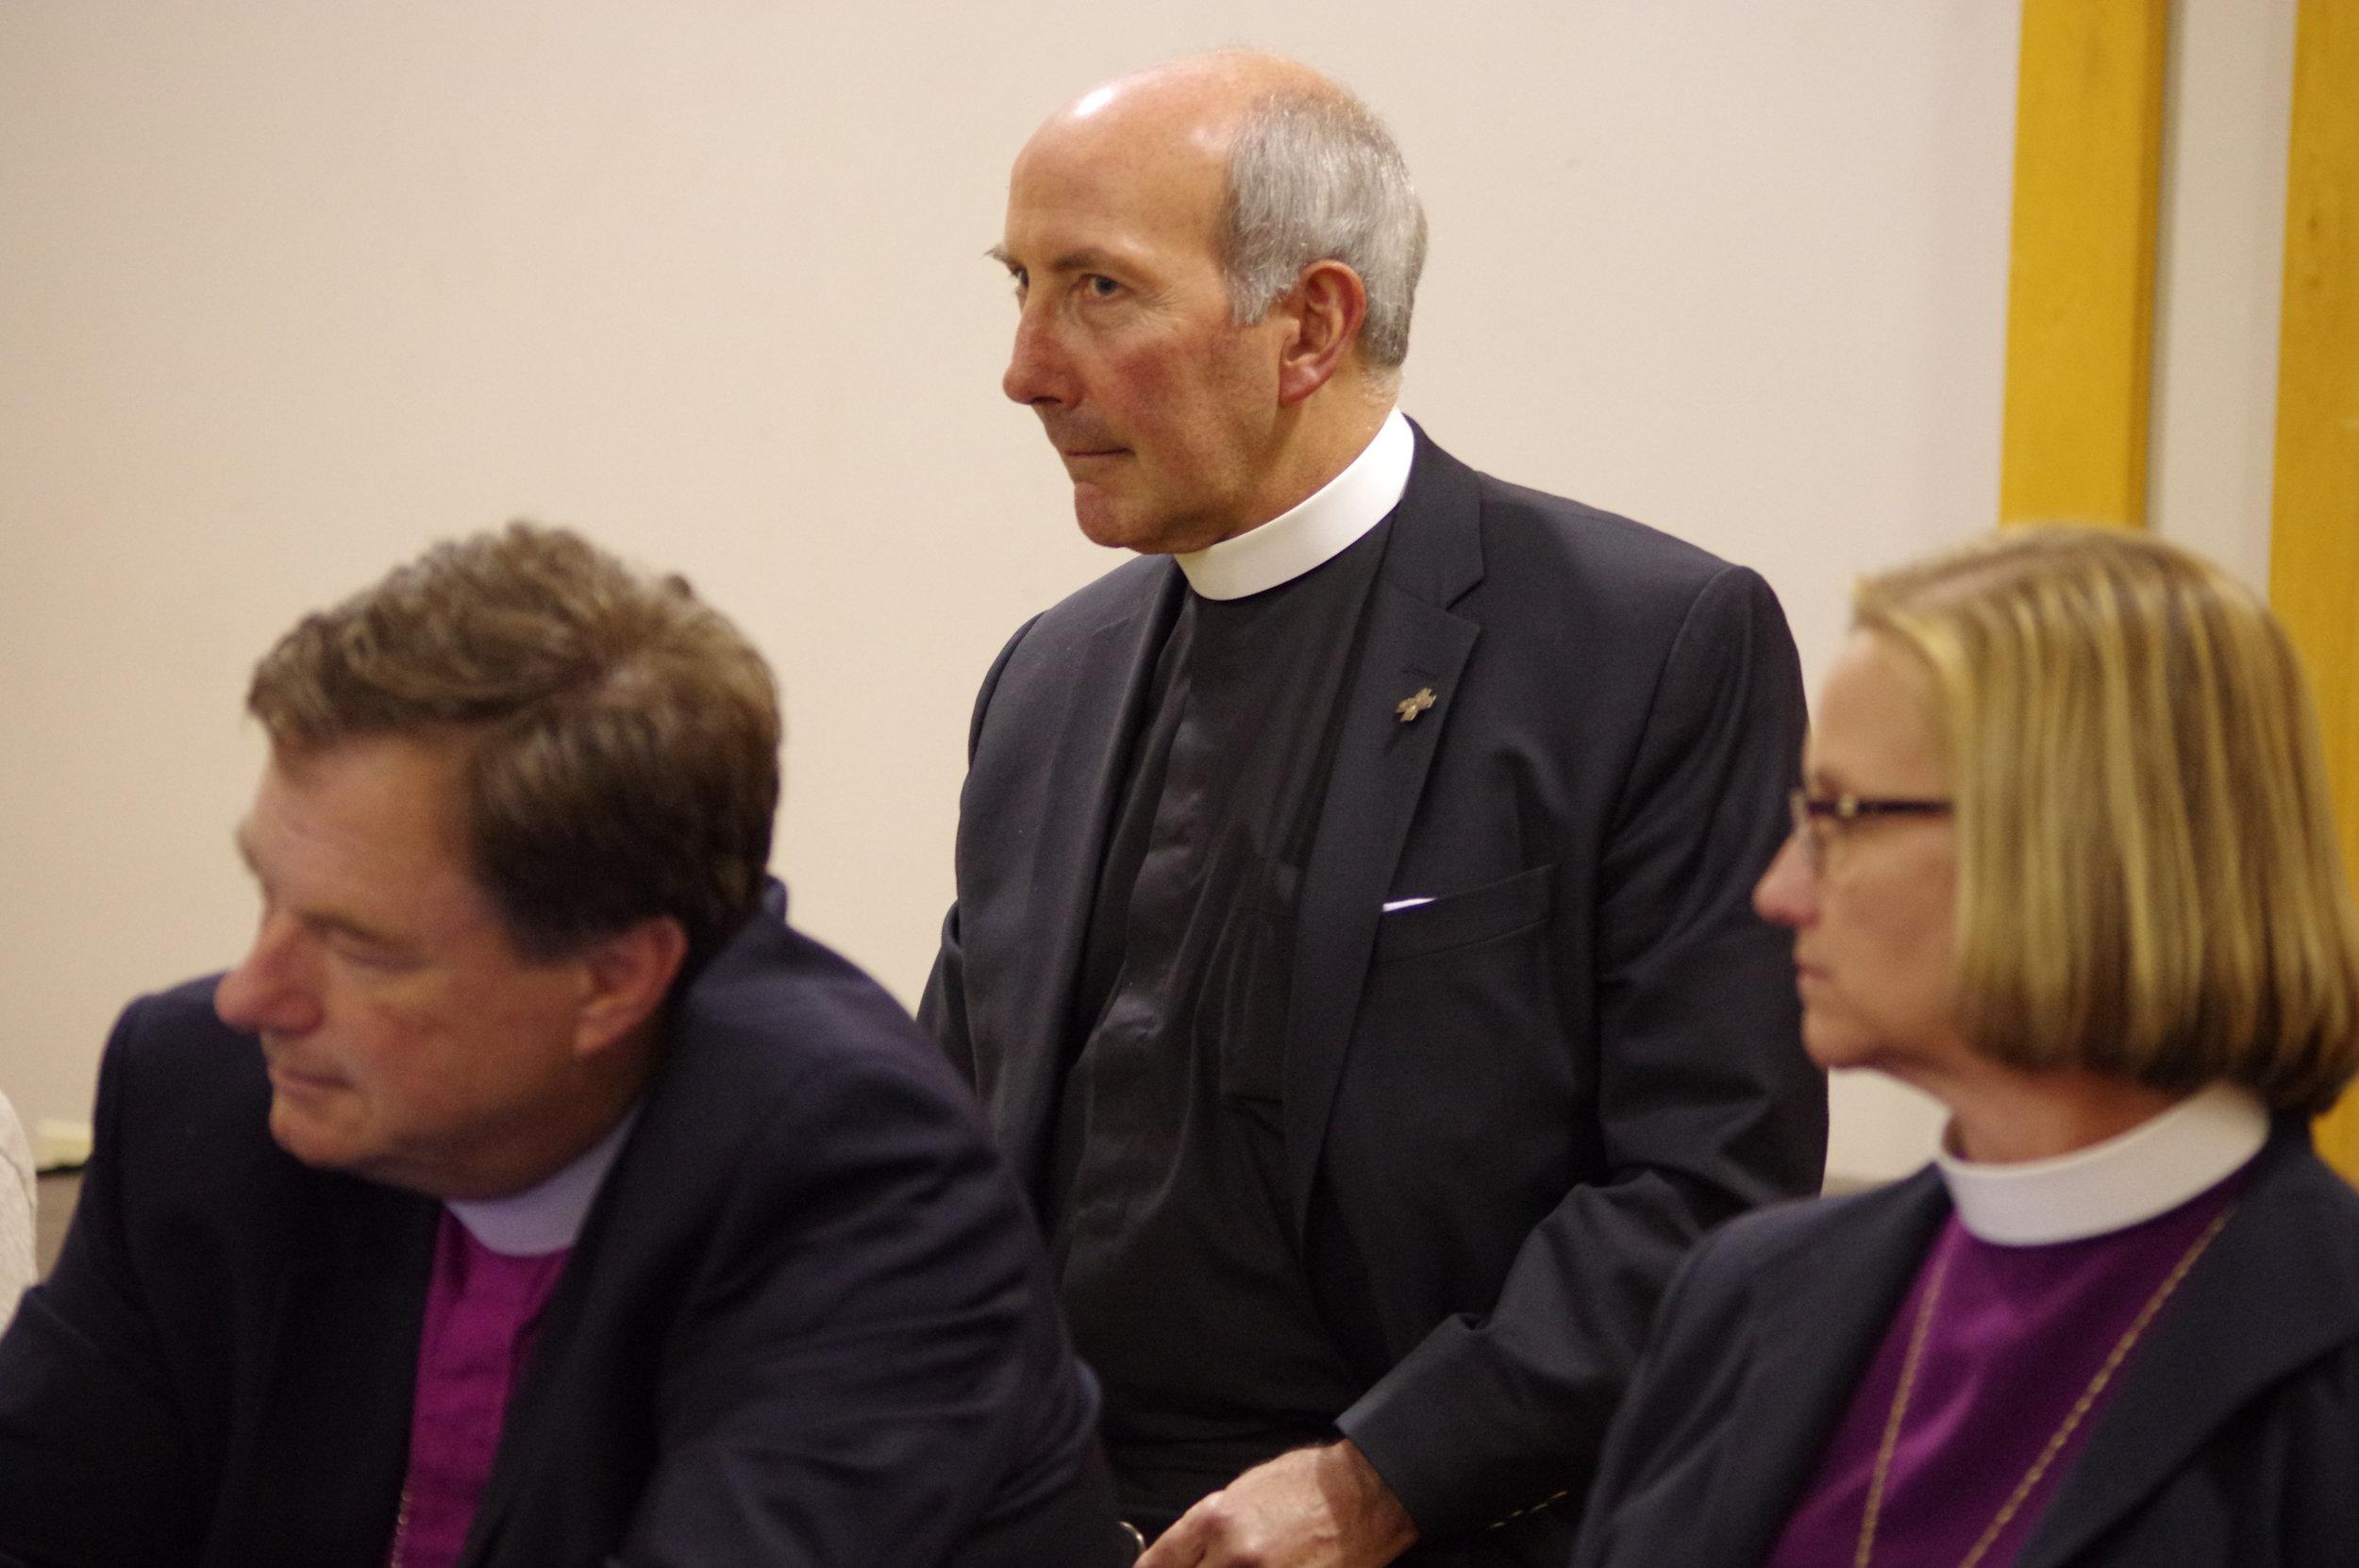 The Rev. Canon George F. Woodward III, center / Photo Glen Mitchell